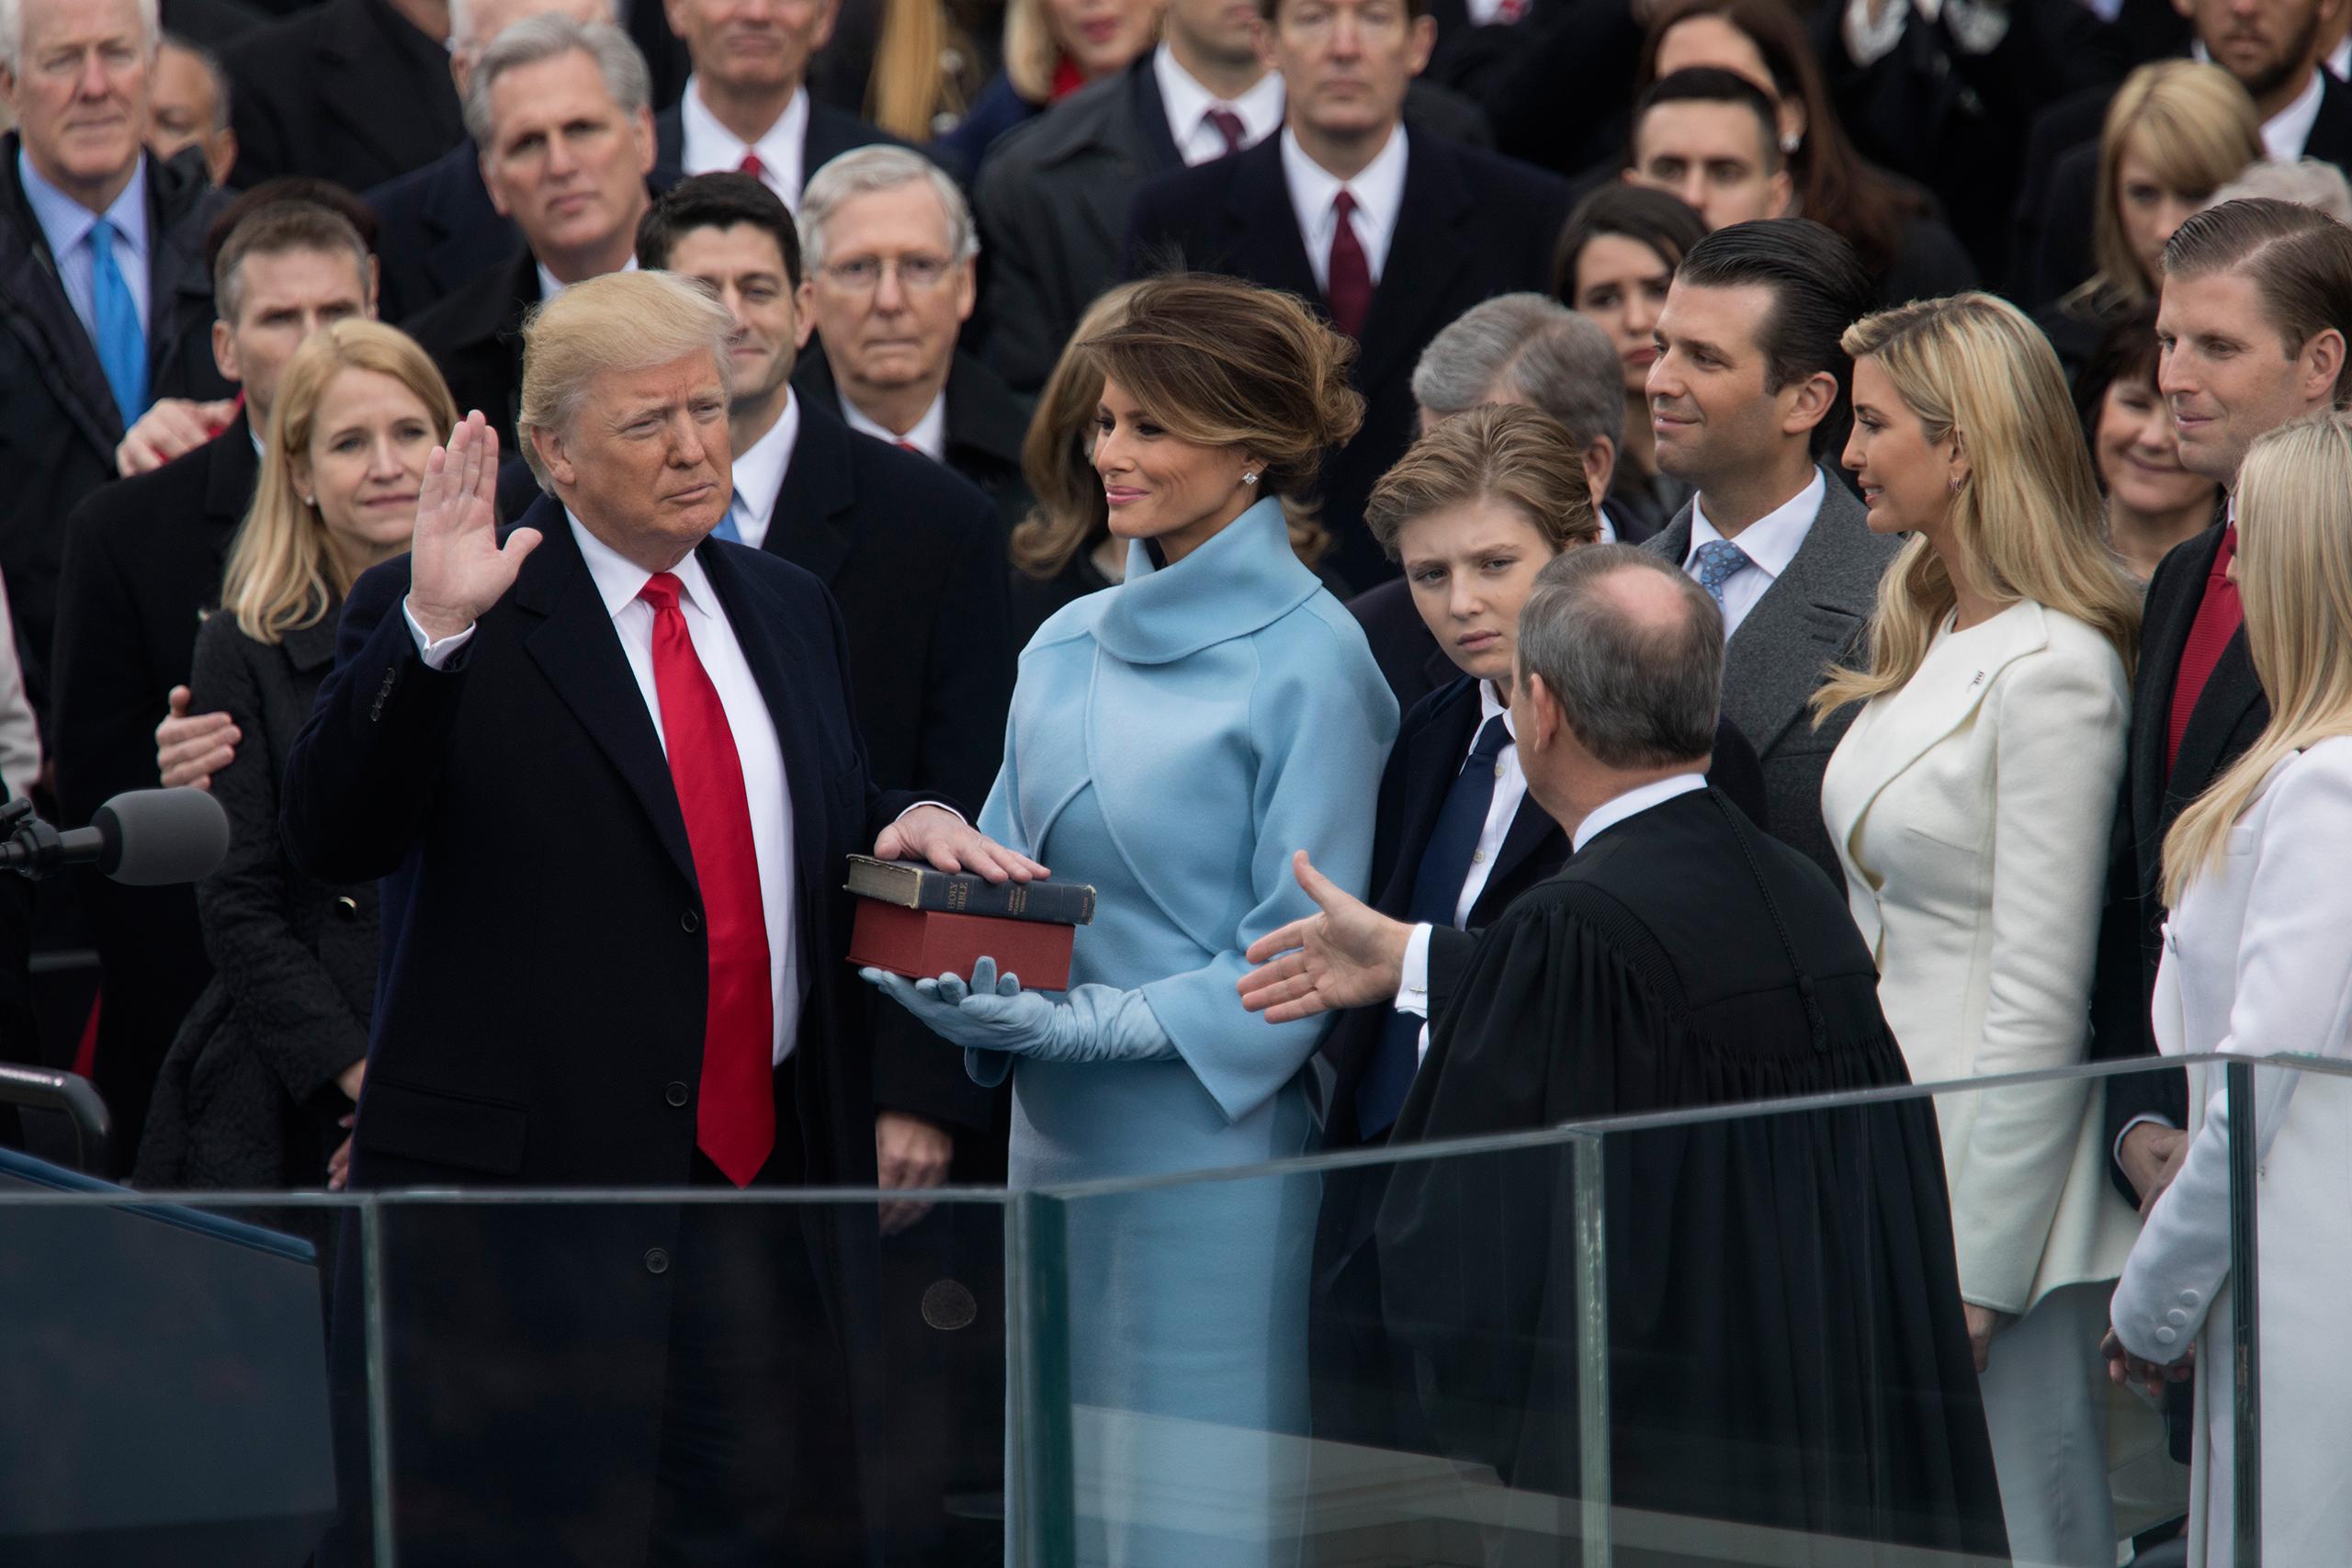 Trump Inauguration: President Donald Trump's Big Day